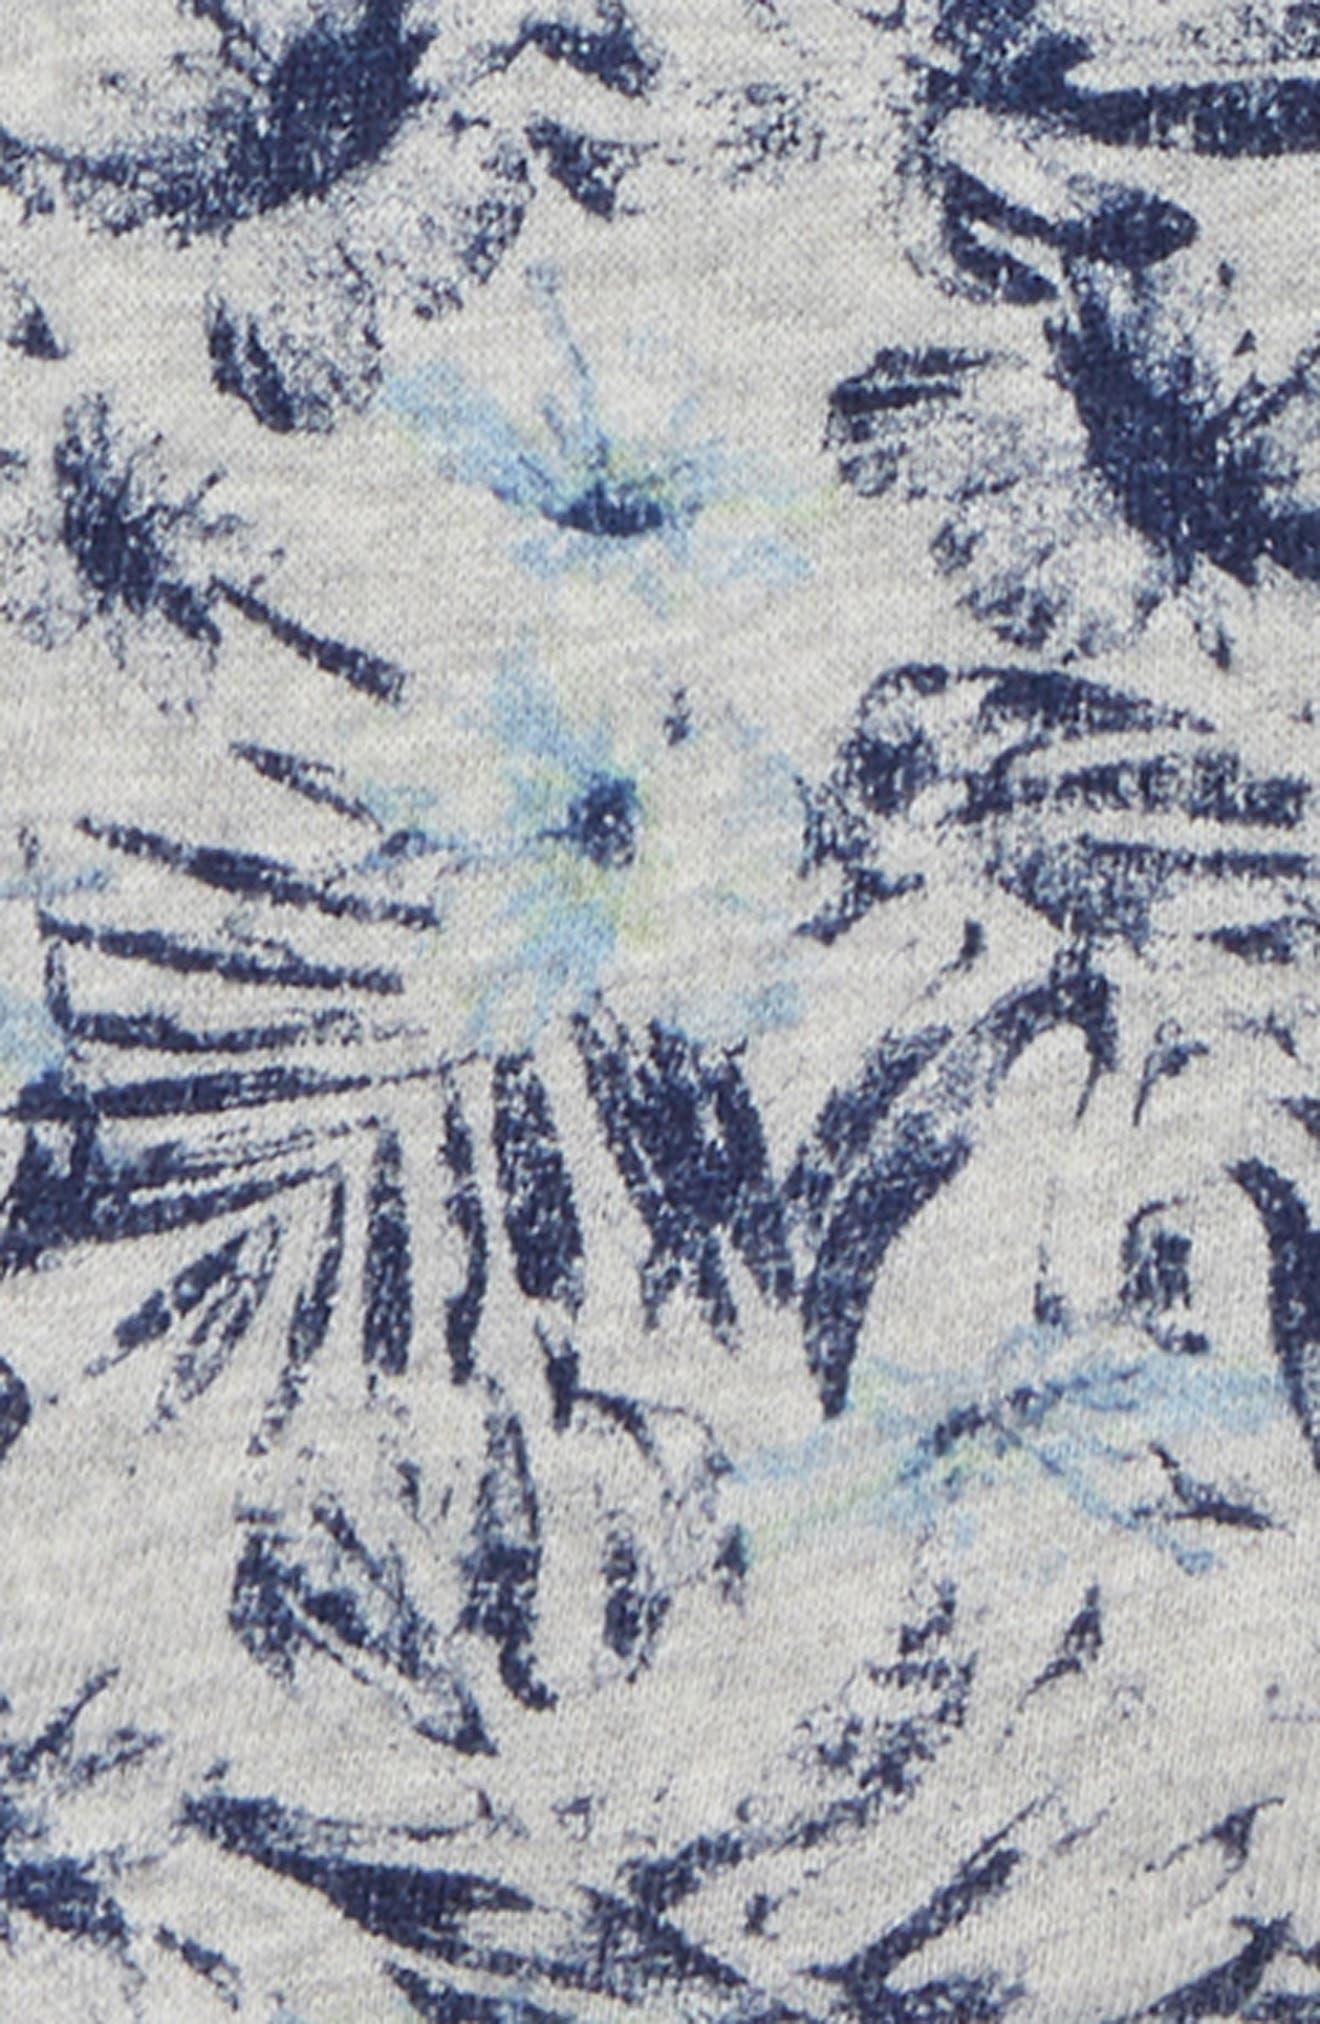 Henley T-Shirt & Print Shorts,                             Alternate thumbnail 2, color,                             430